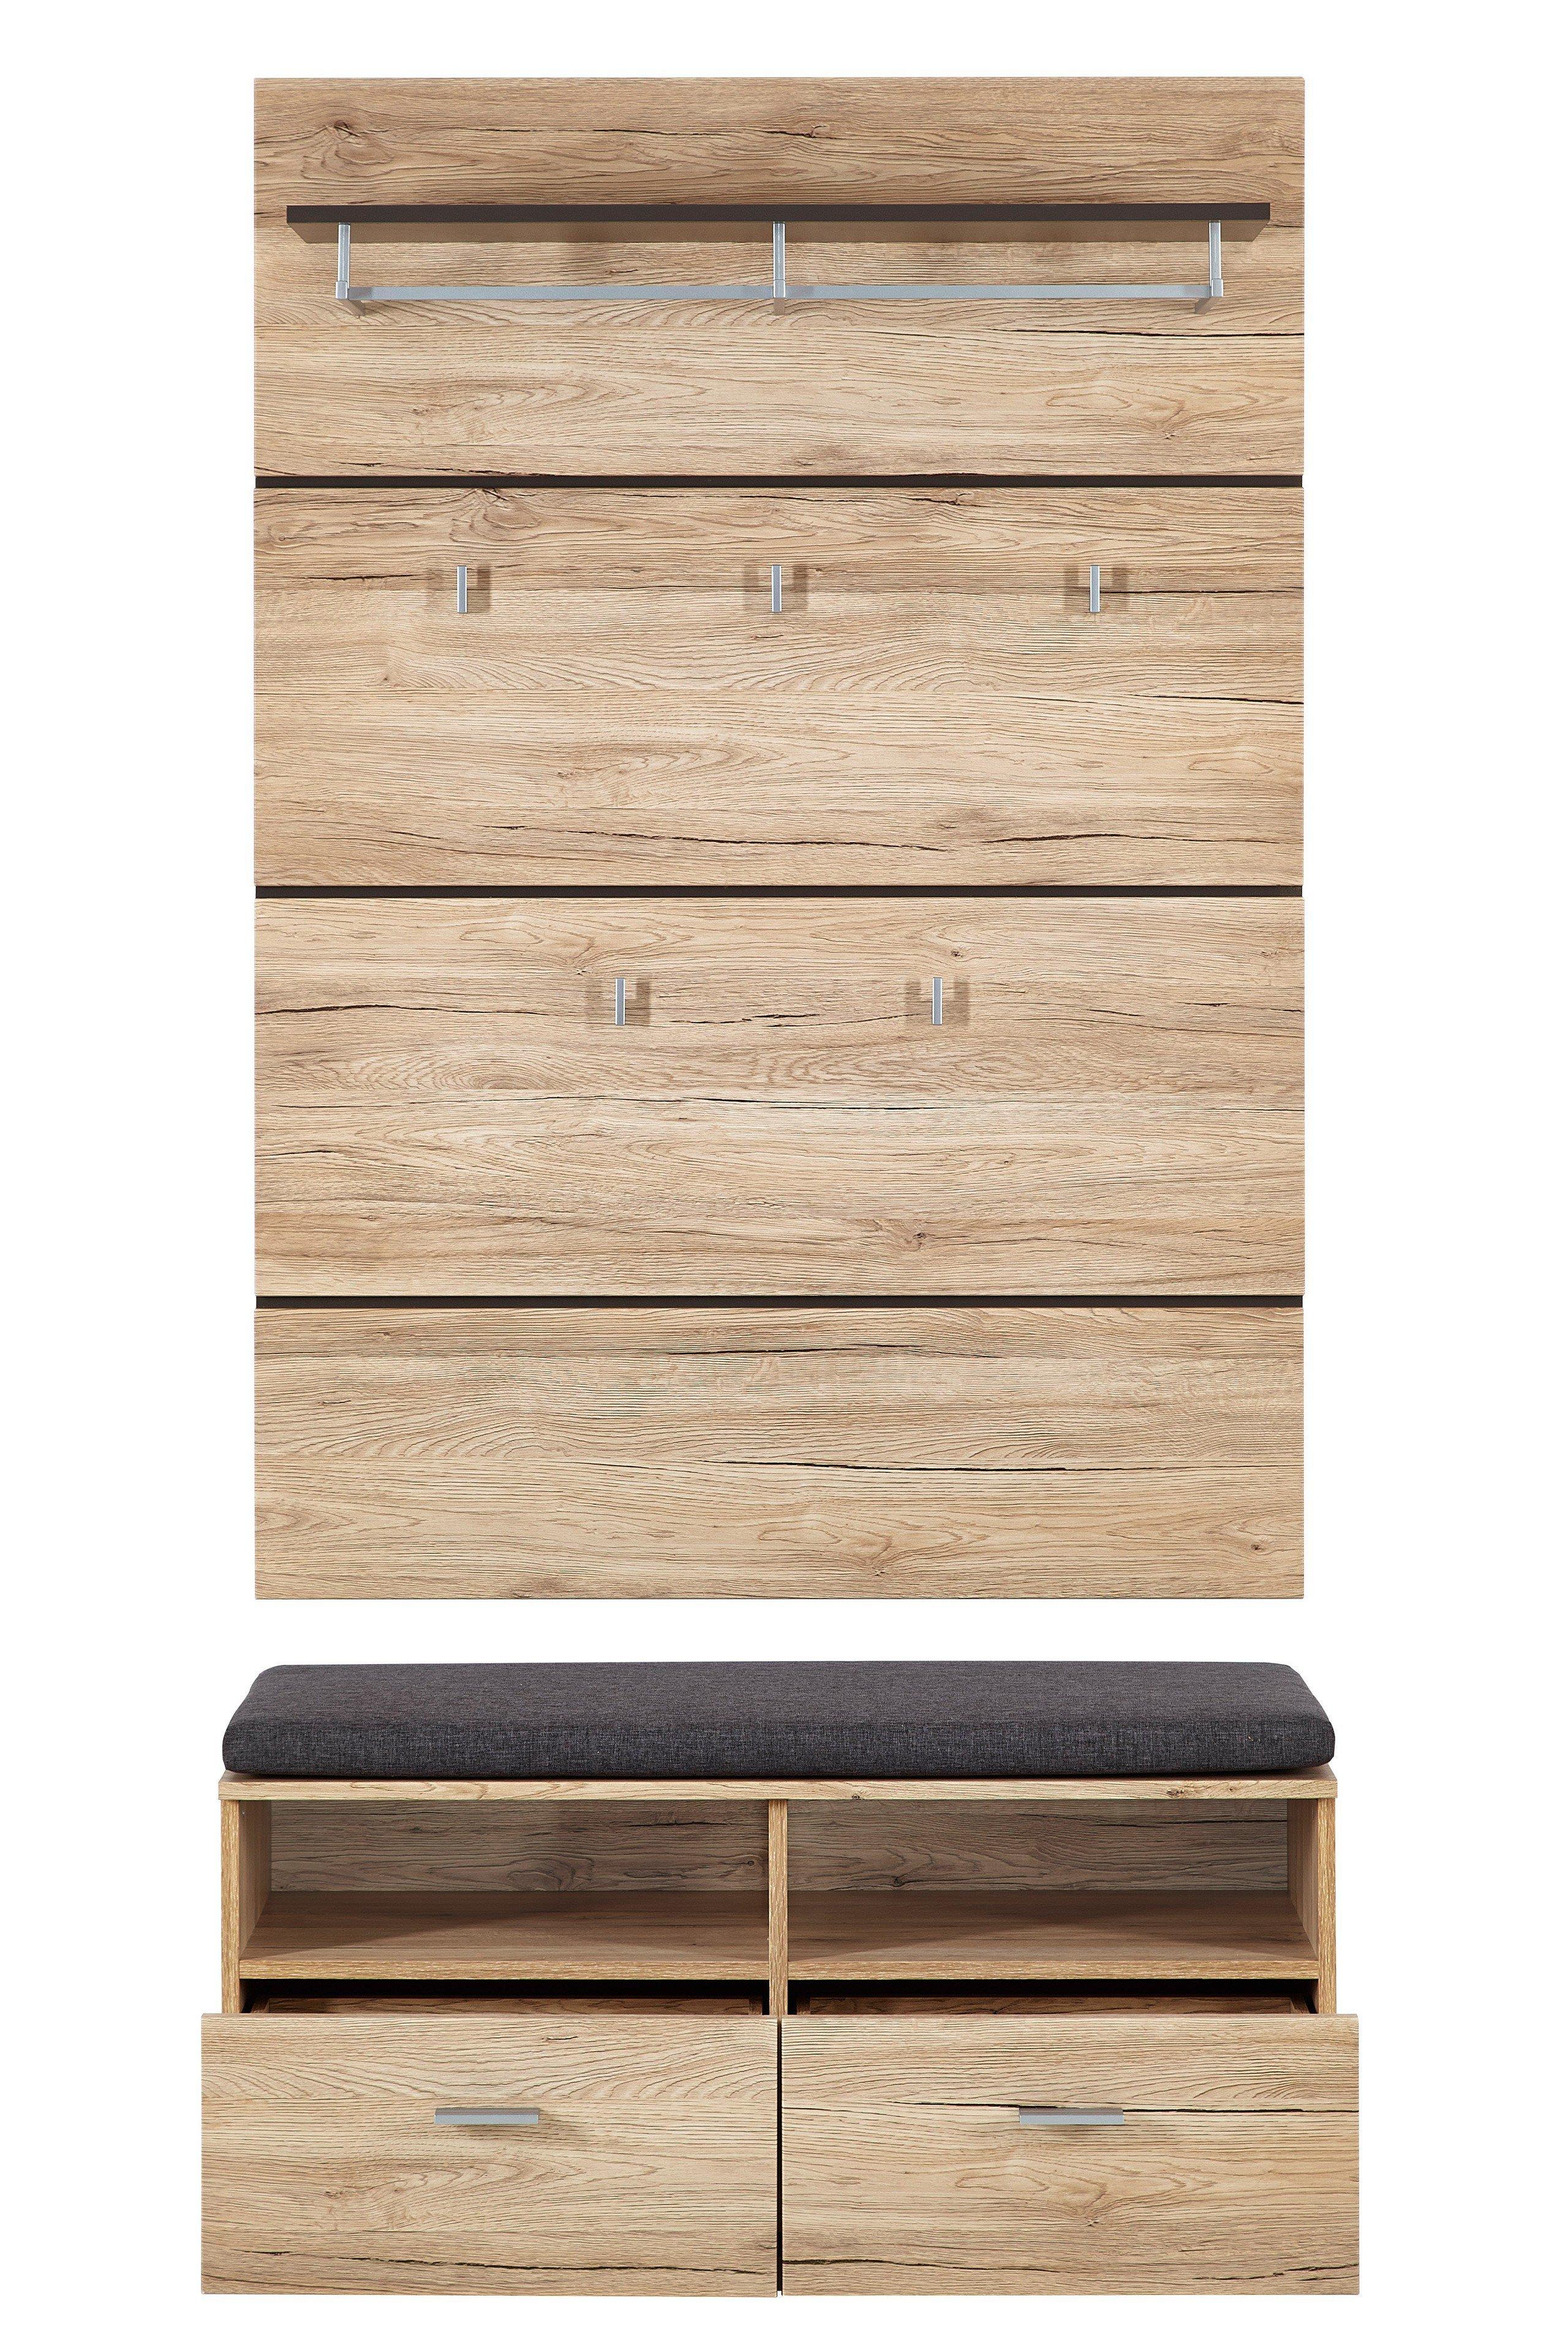 eiche hell mbel good with eiche hell mbel bank truhe eichehell massivholz sitztruhe sitzbank. Black Bedroom Furniture Sets. Home Design Ideas